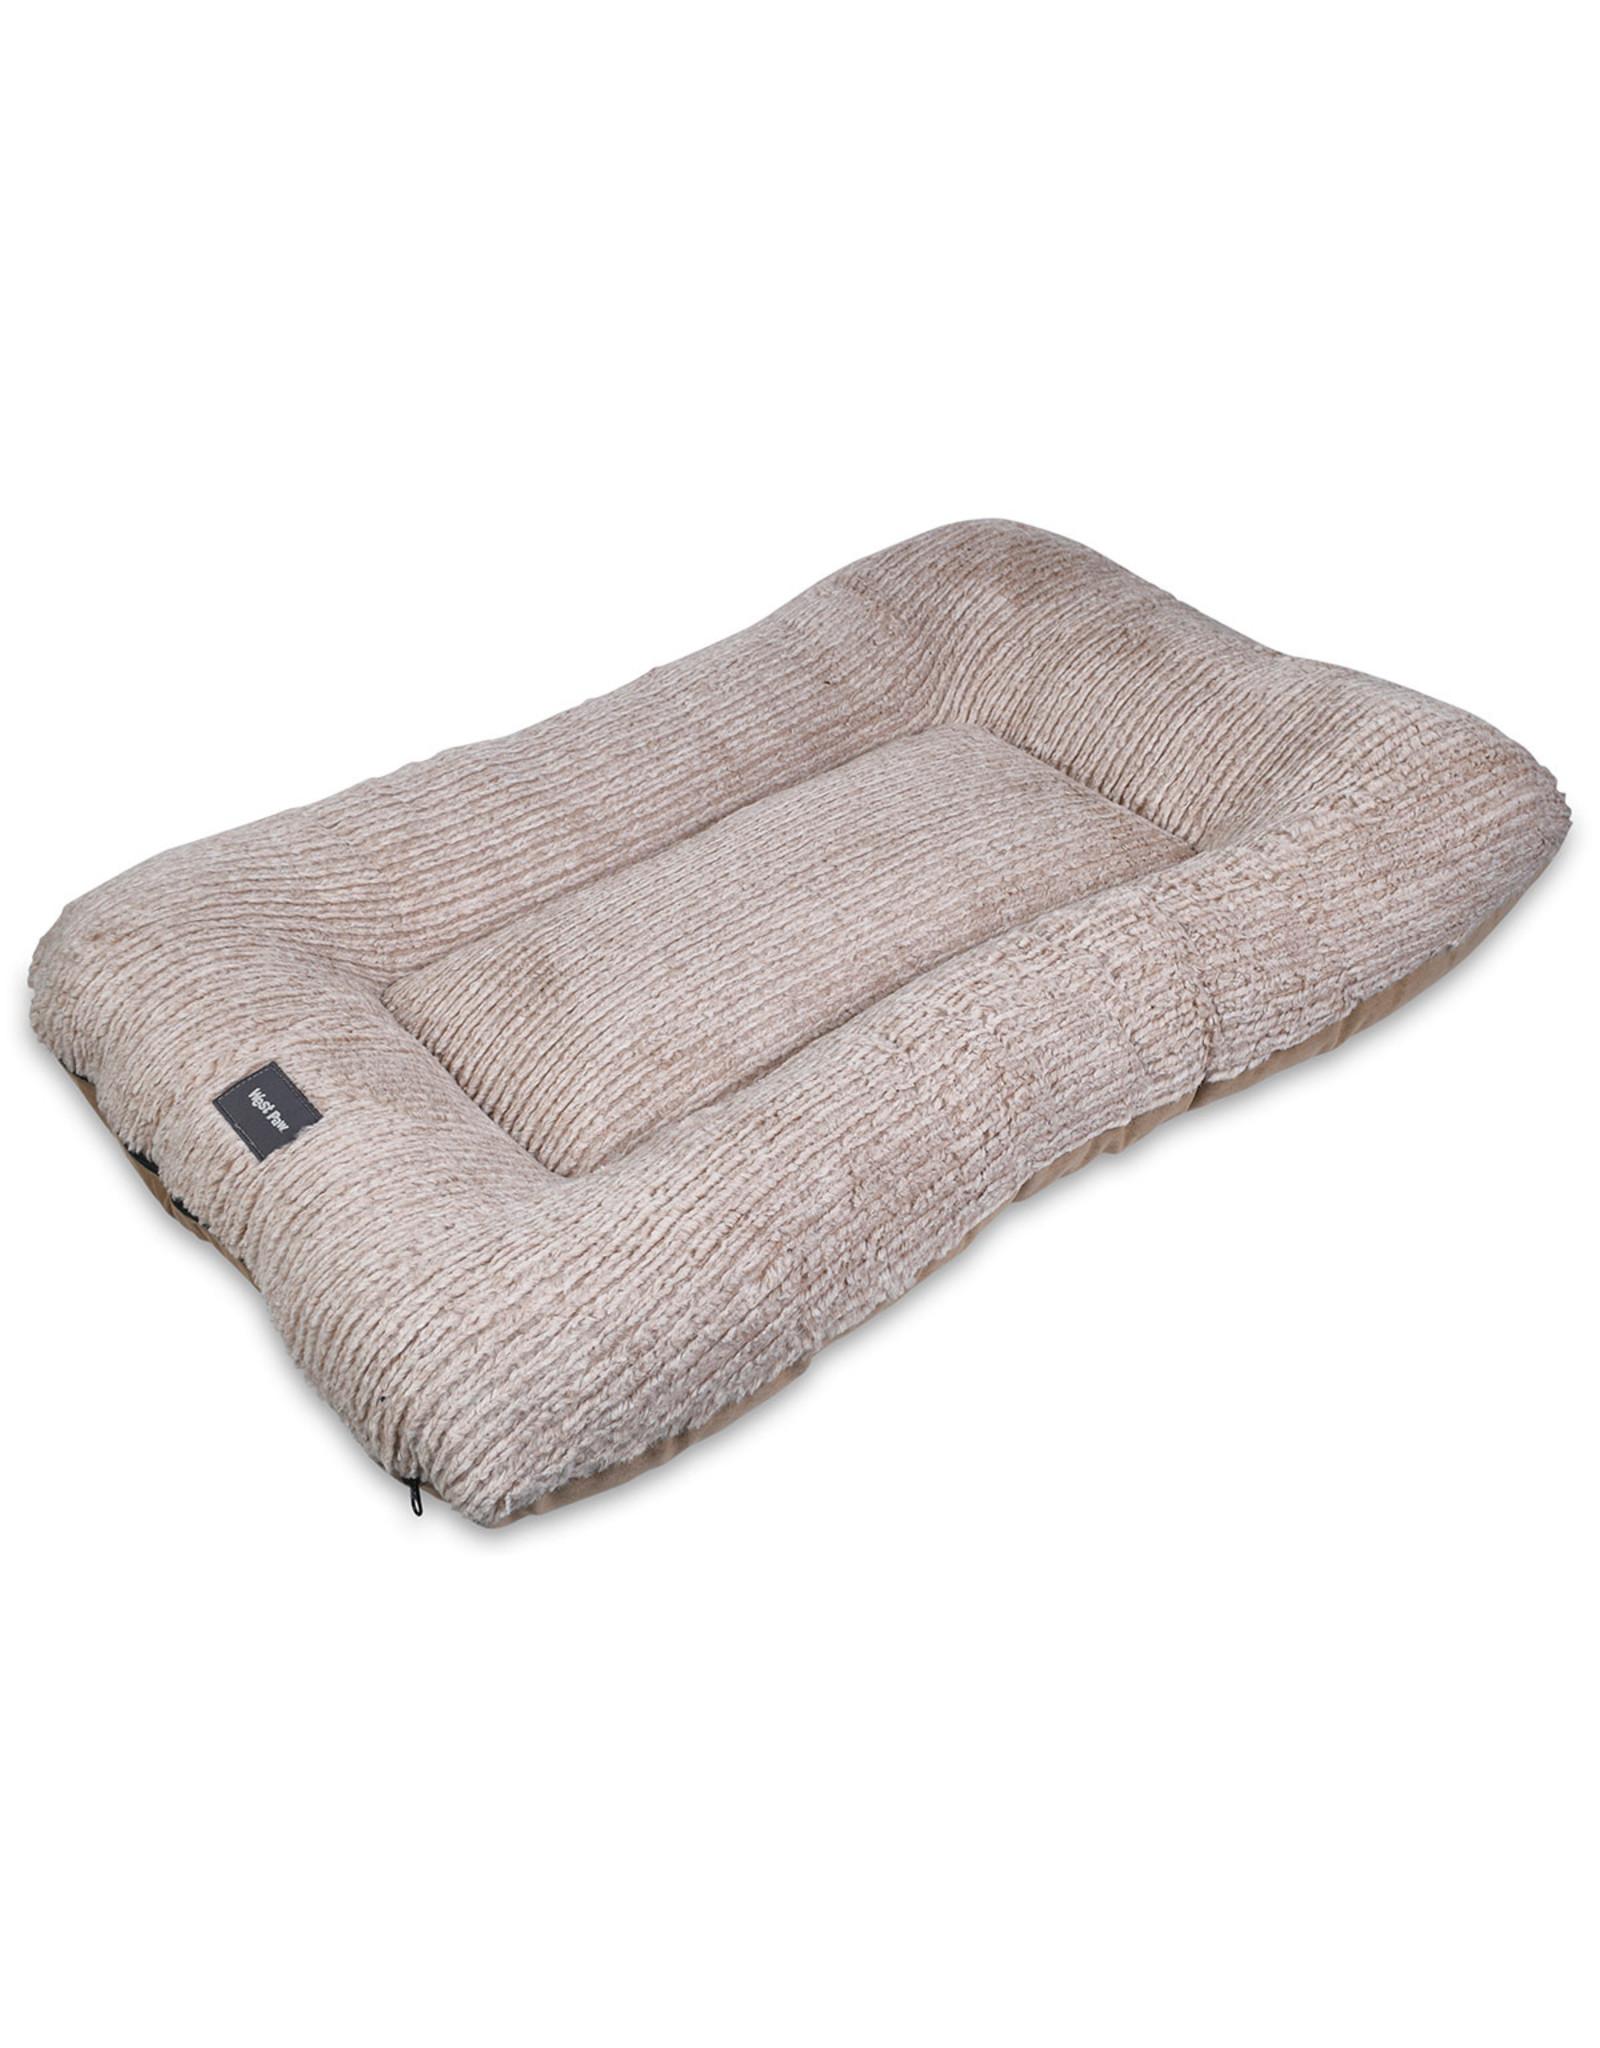 West Paw Designs Westpaw: Heyday Bed® - M 32x22 Oatmeal Heather